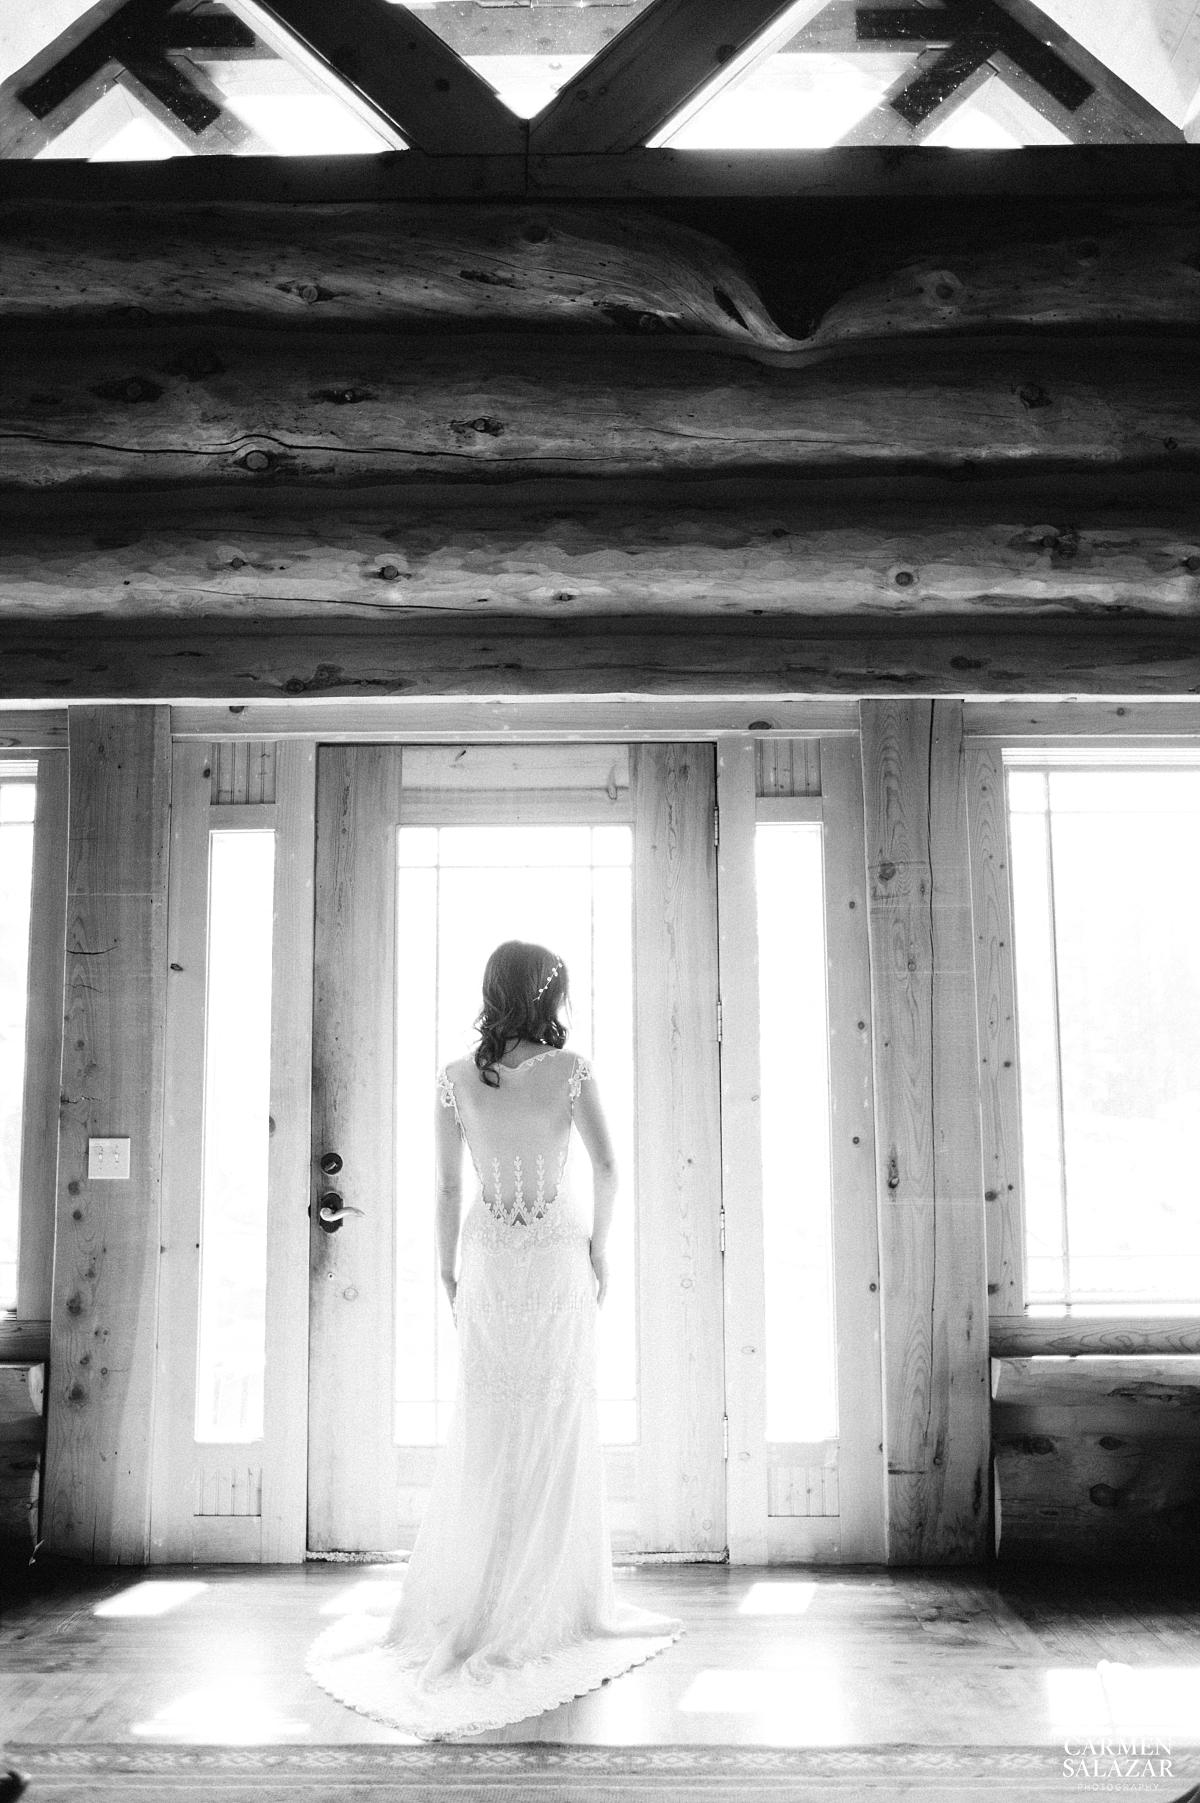 Dreamy vintage bride silhouette - Carmen Salazar